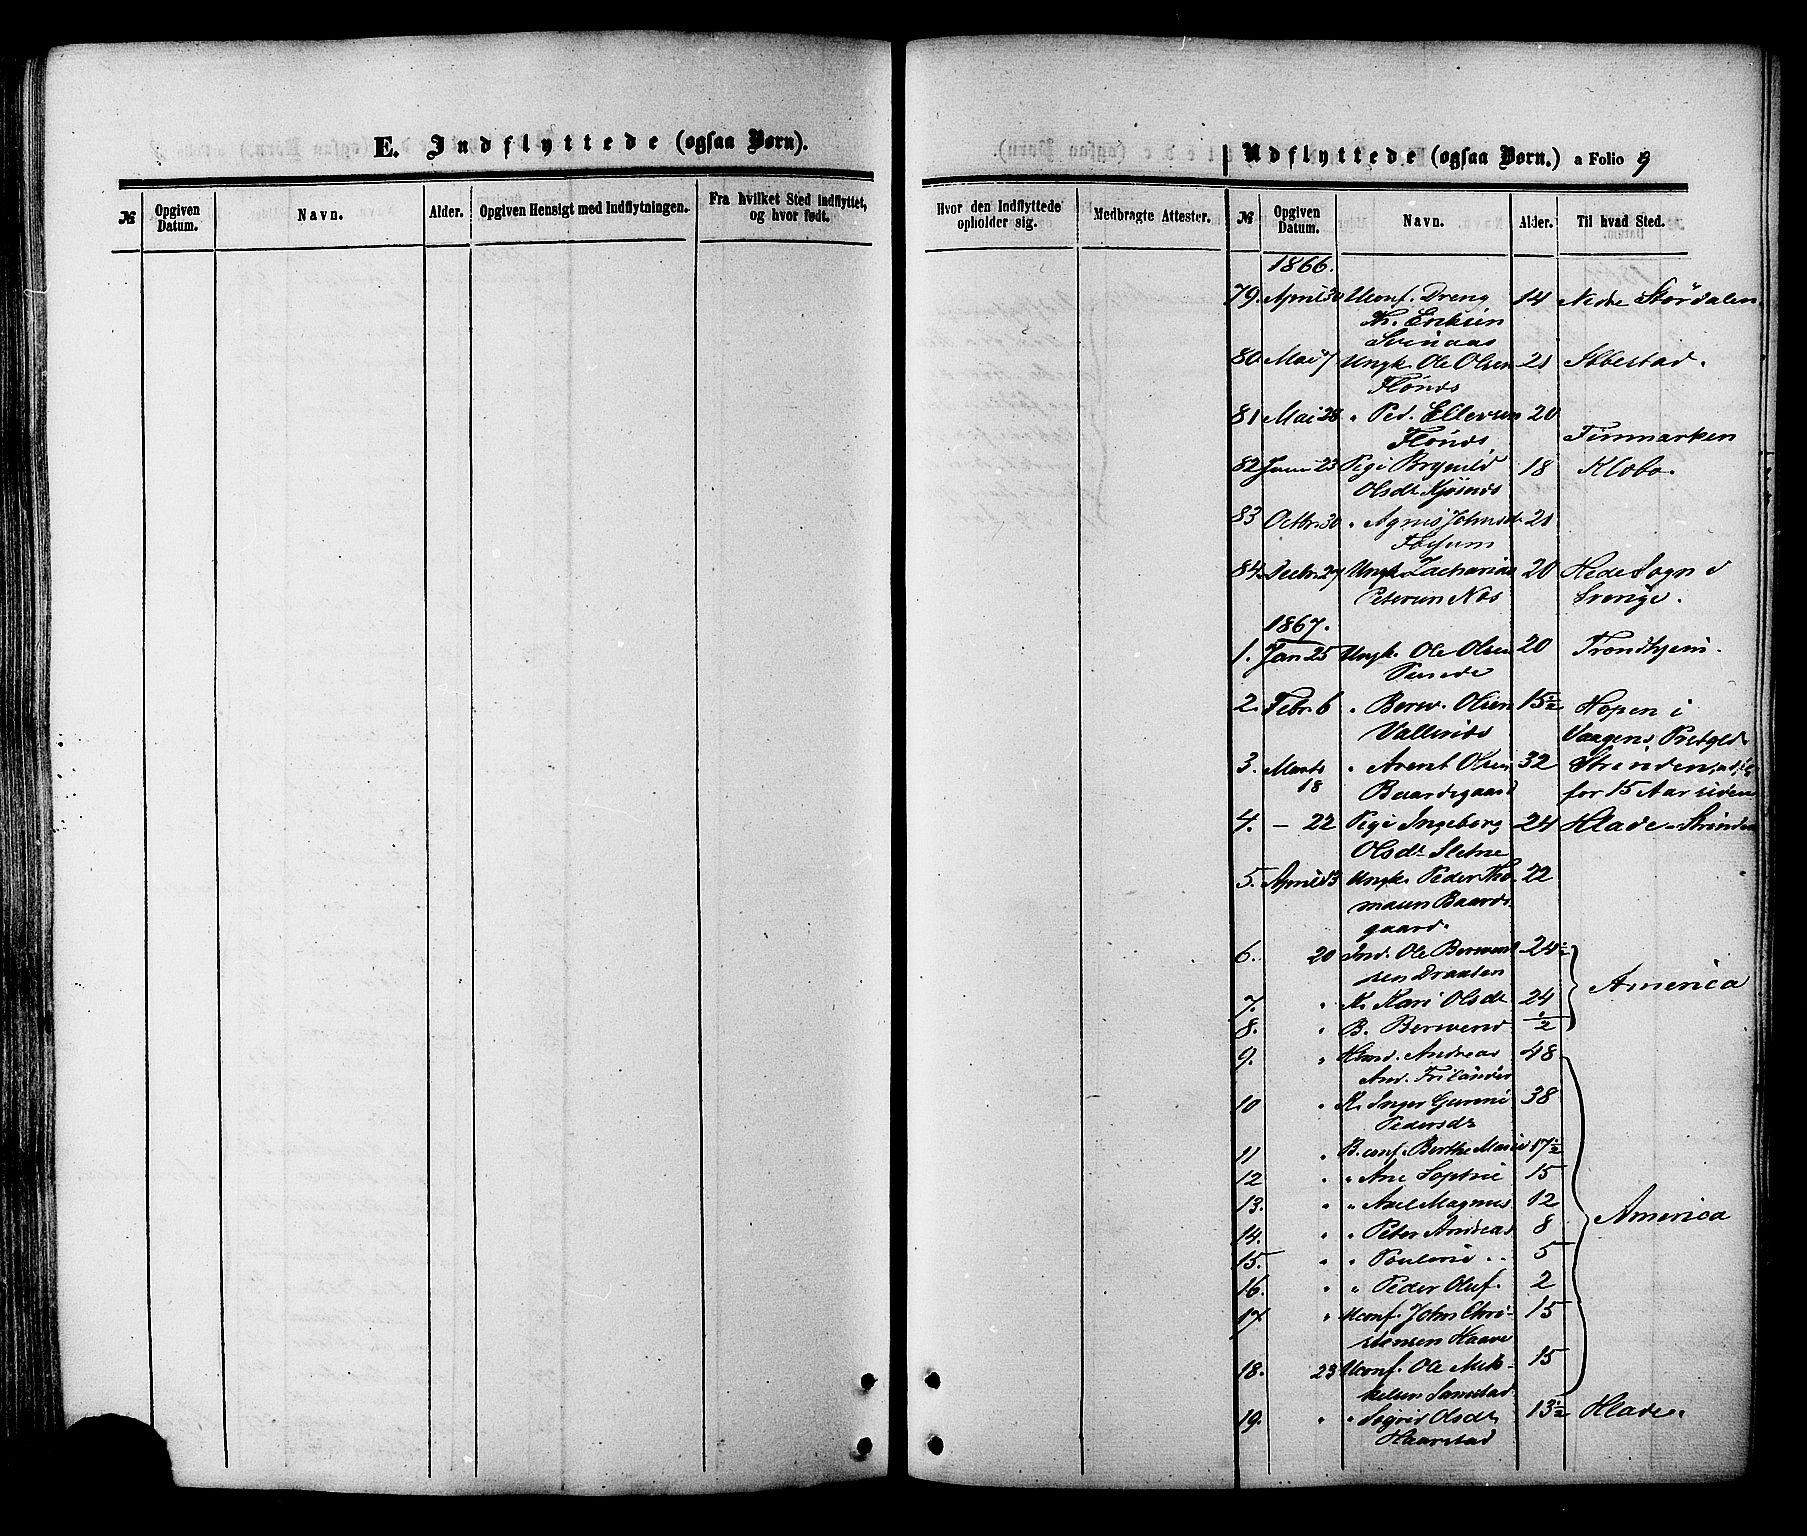 SAT, Ministerialprotokoller, klokkerbøker og fødselsregistre - Sør-Trøndelag, 695/L1147: Parish register (official) no. 695A07, 1860-1877, p. 9